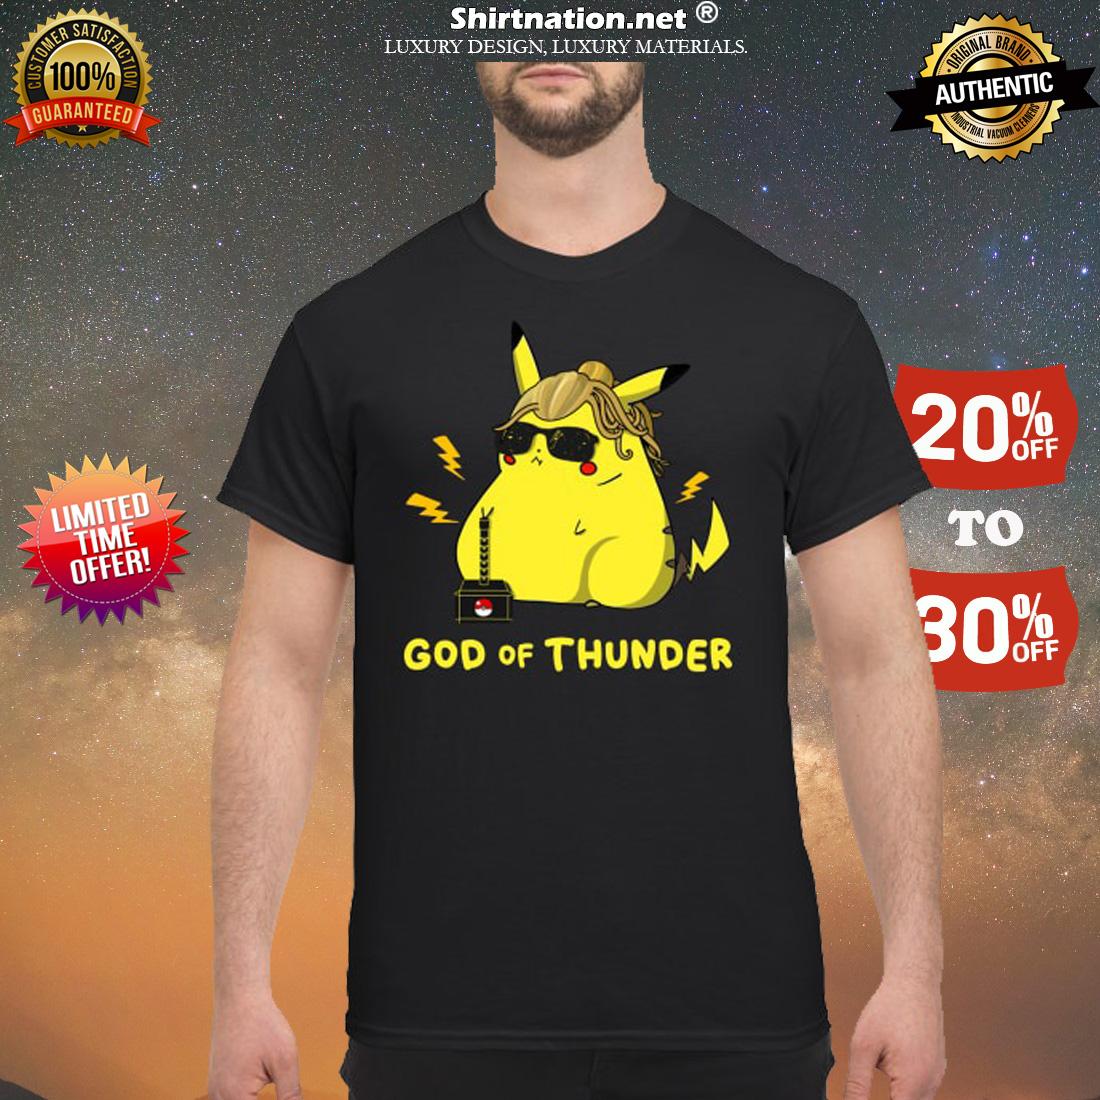 Pikachu God of thunder shirt